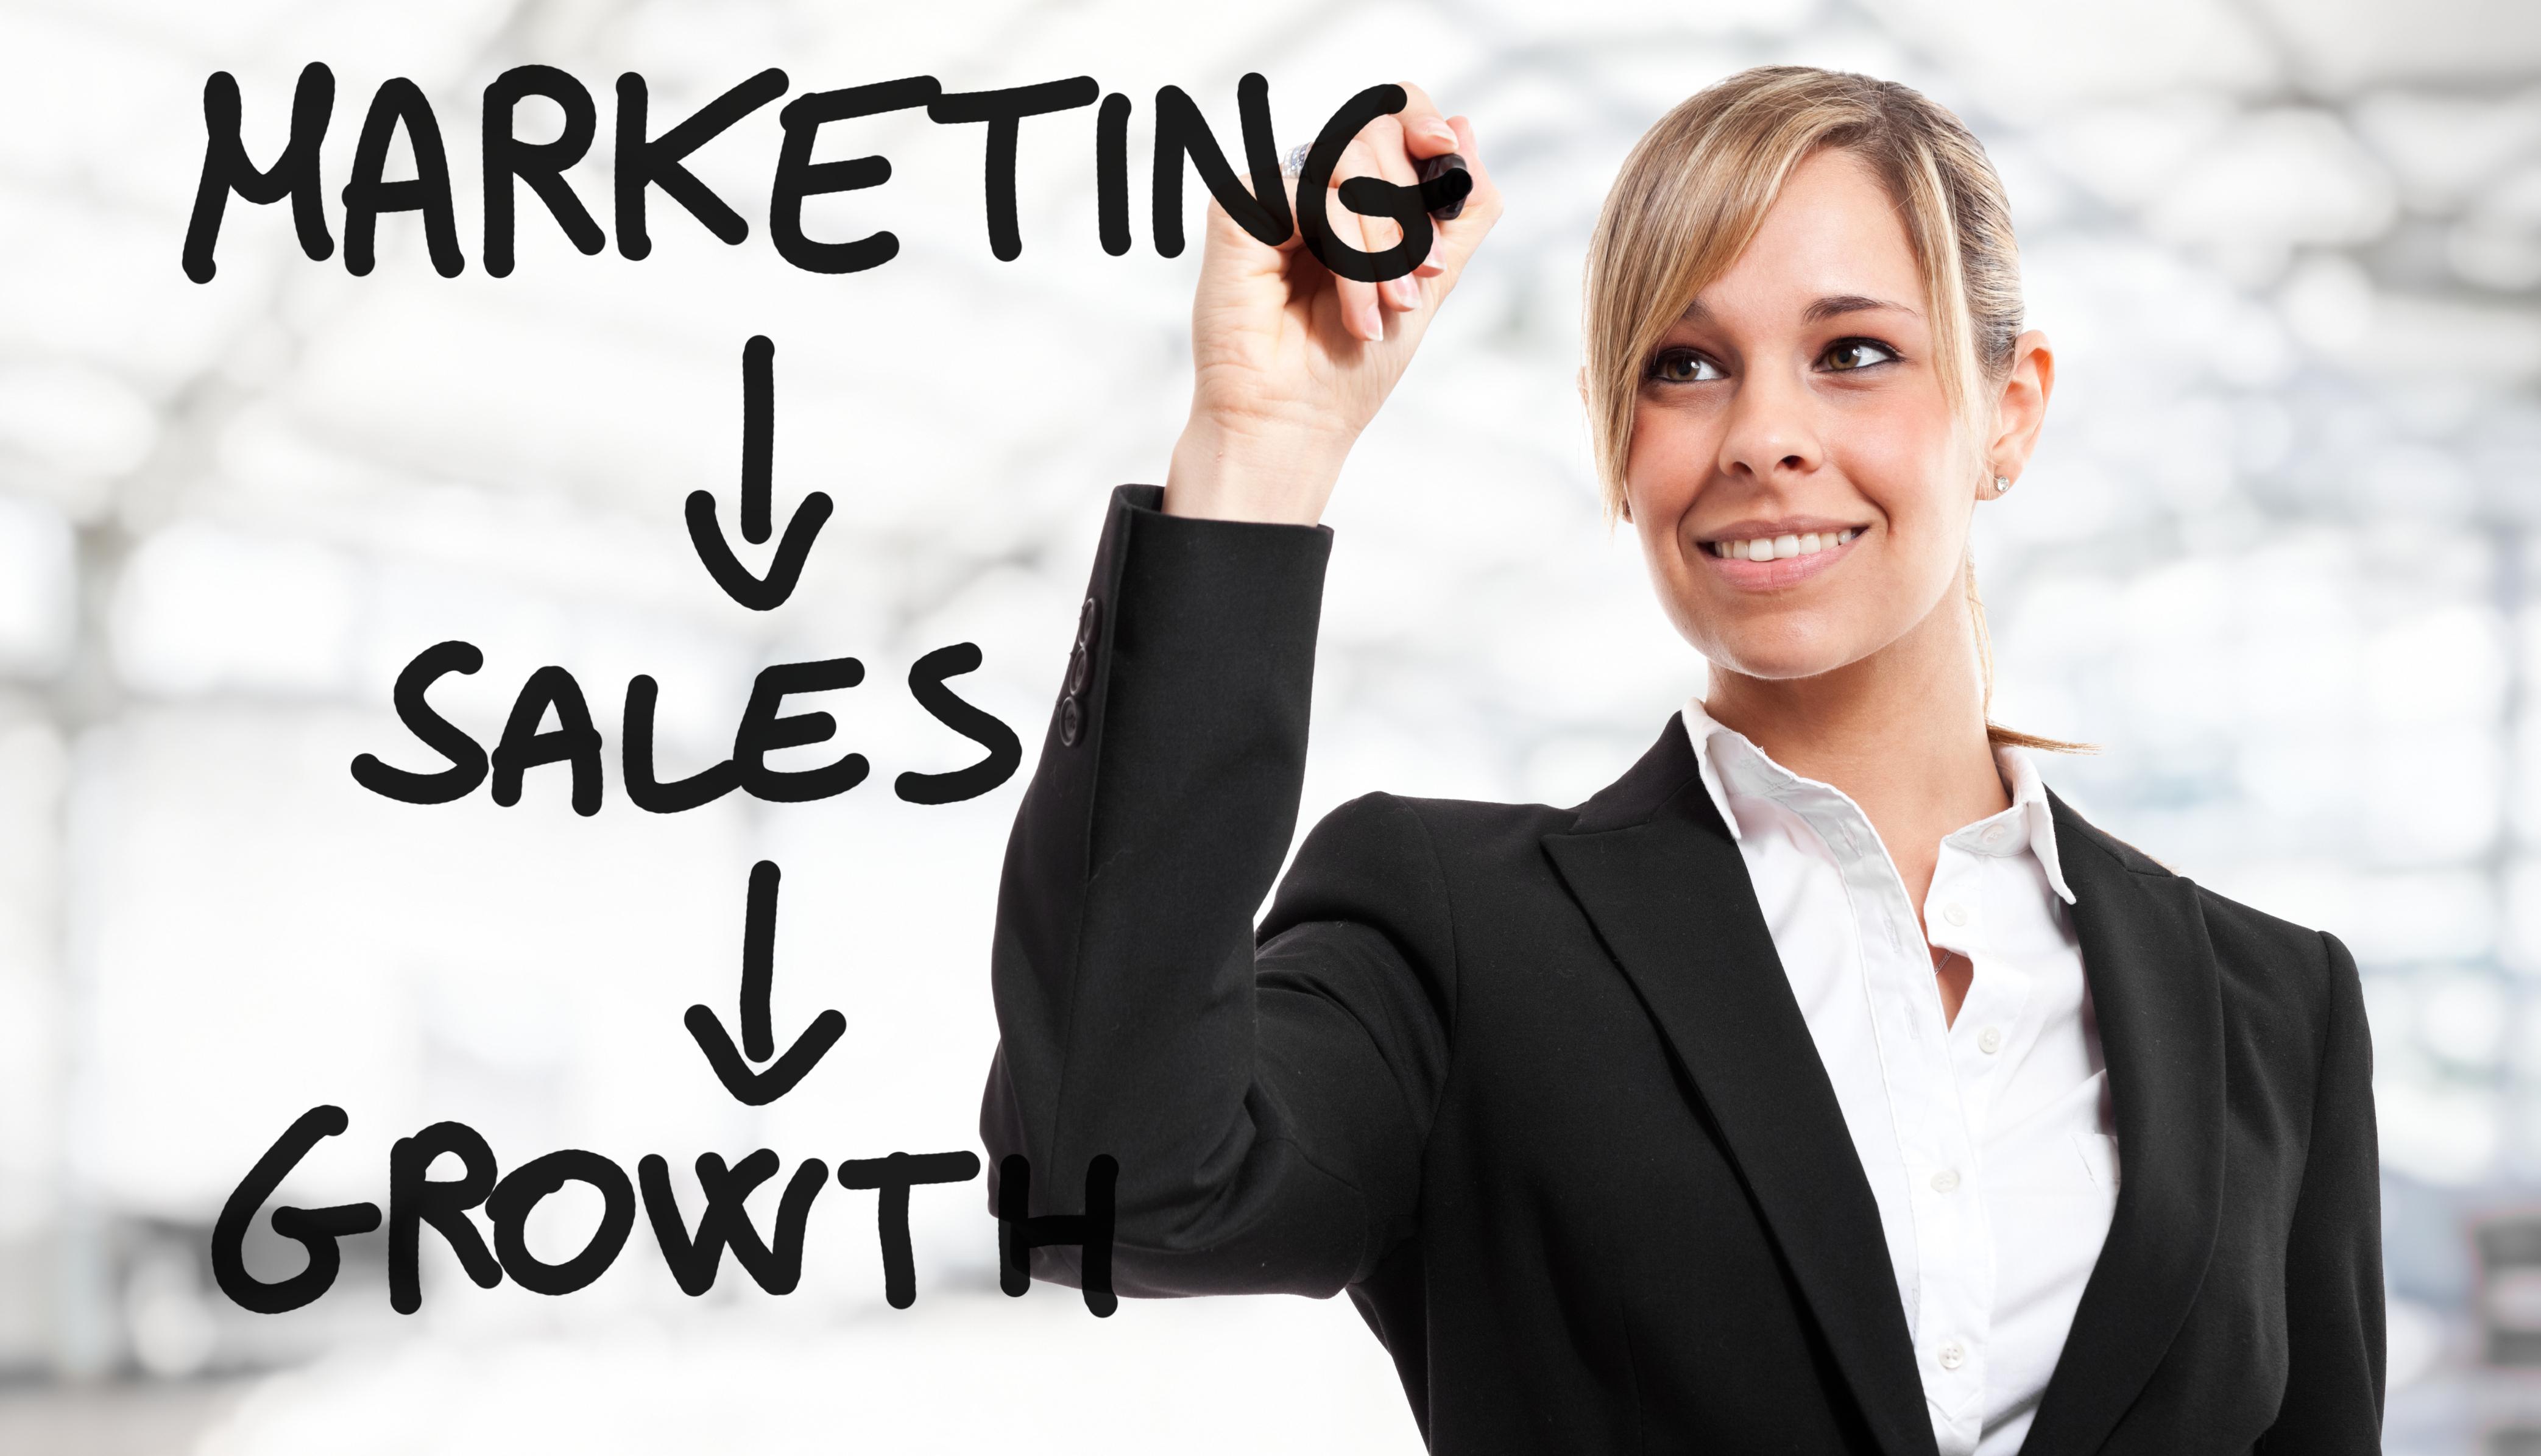 marketing-2 - Copy